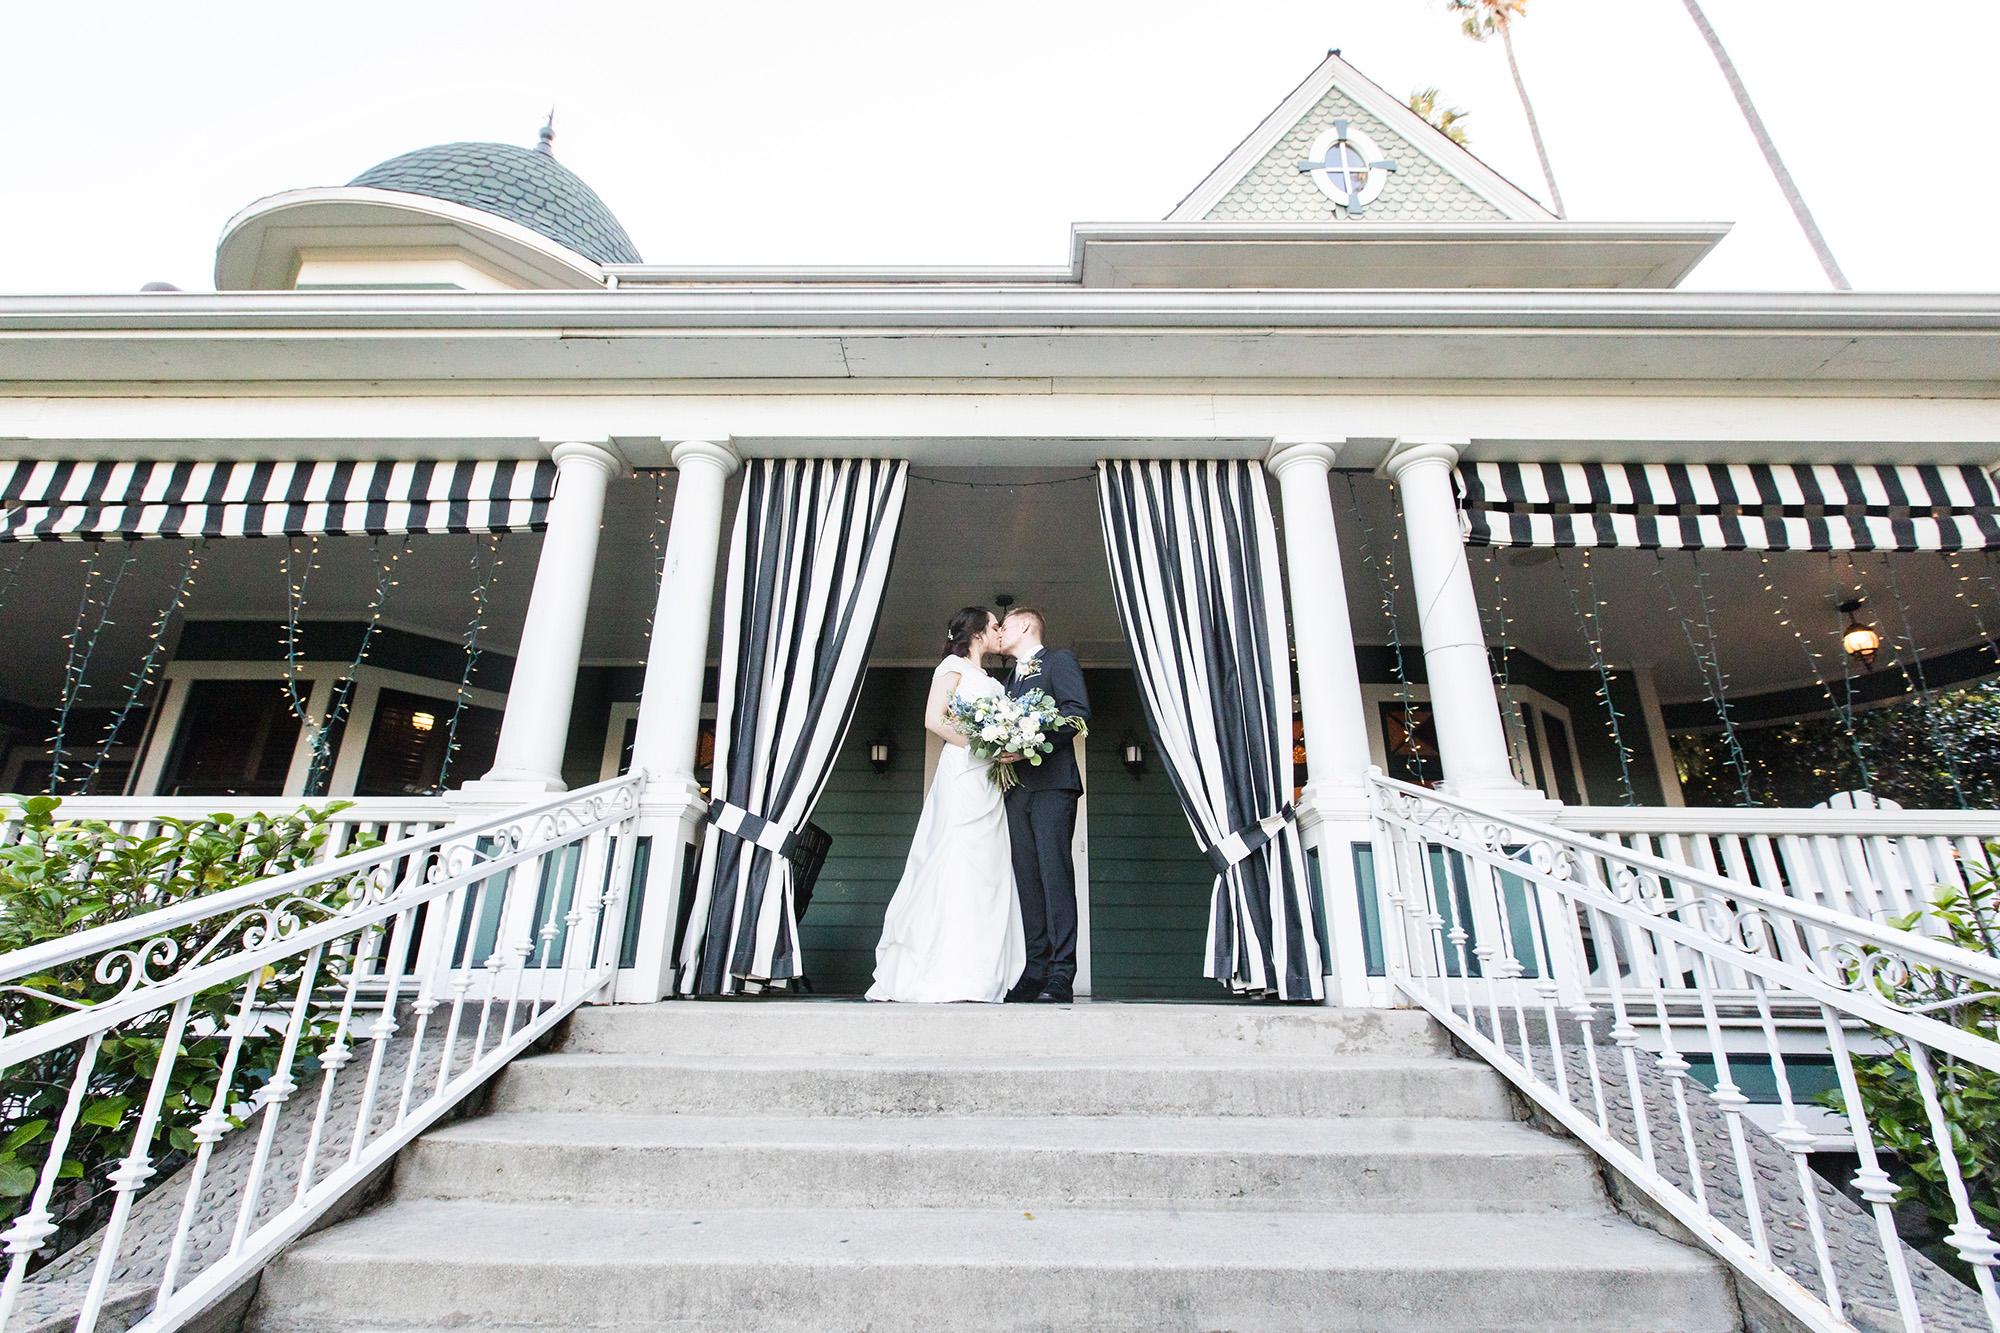 associate-photographer-christmas-house-wedding-carrie-vines-0022.jpg